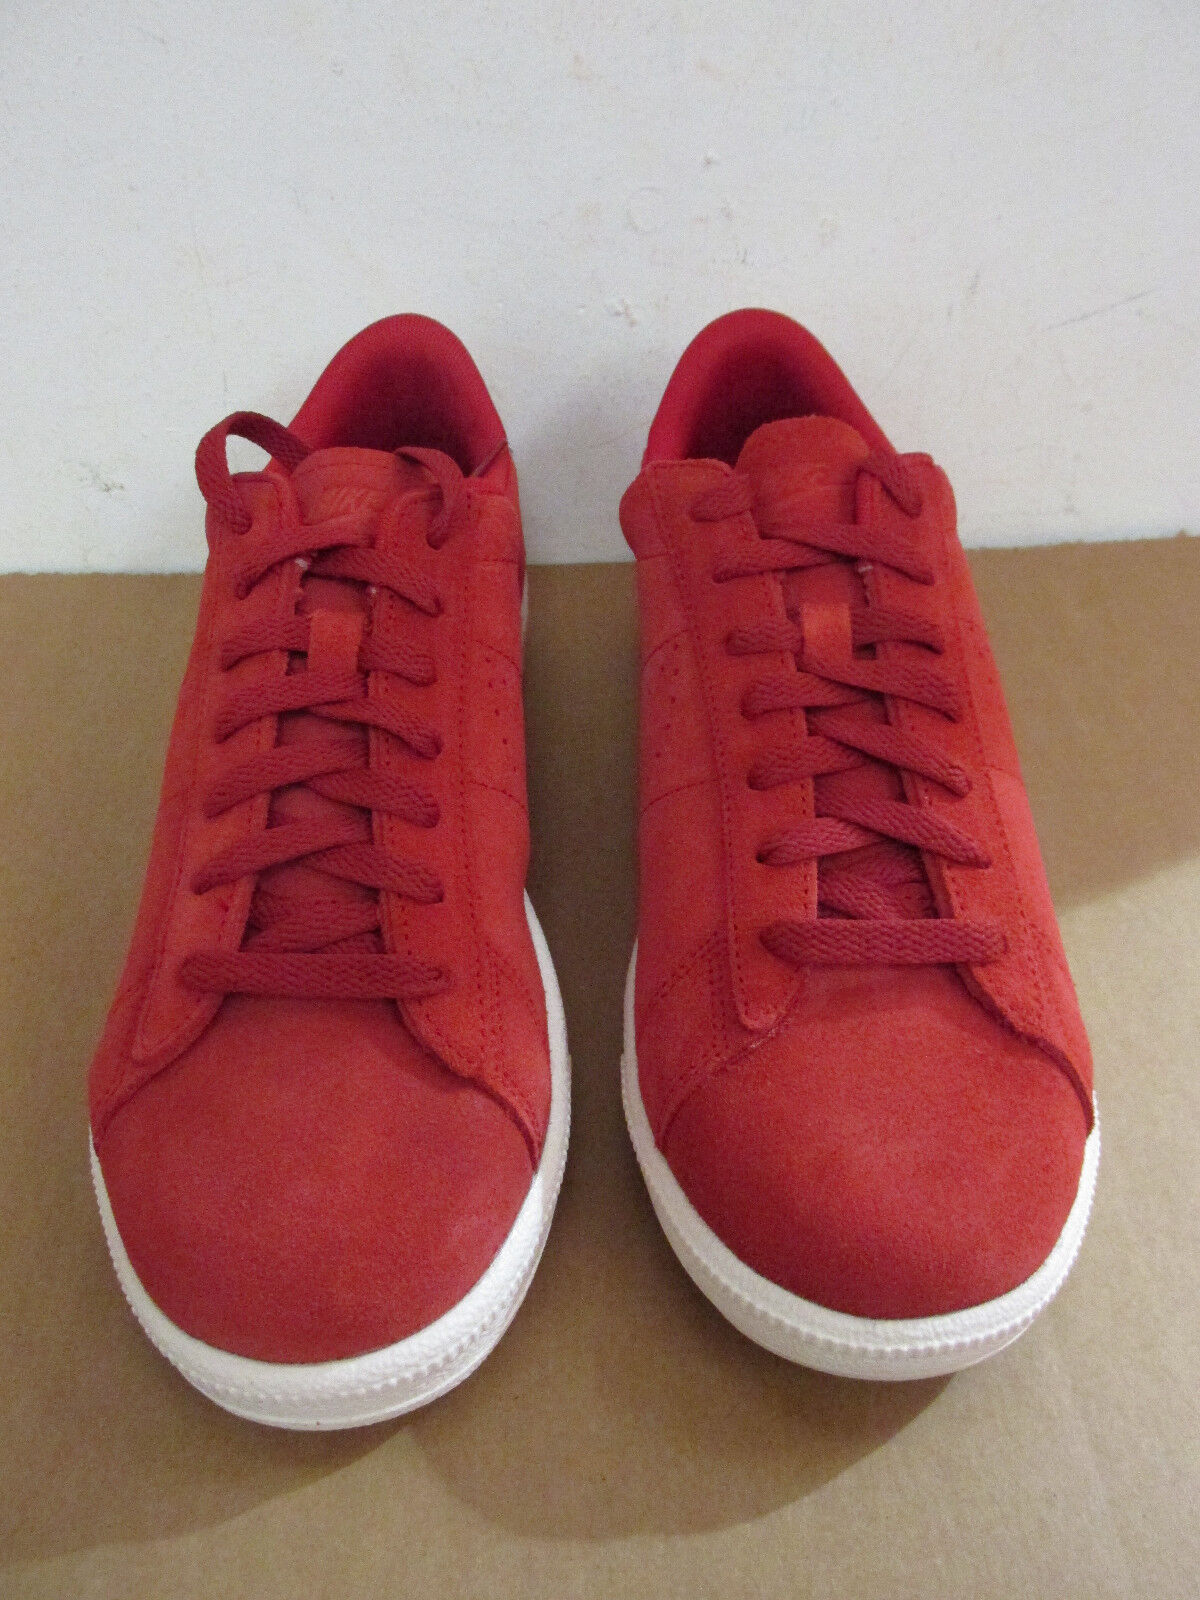 Nike Herren Tennis Klassisch Cs Veloursleder Herren Nike Turnschuhe 829351 600 Sneakers 5d58c8